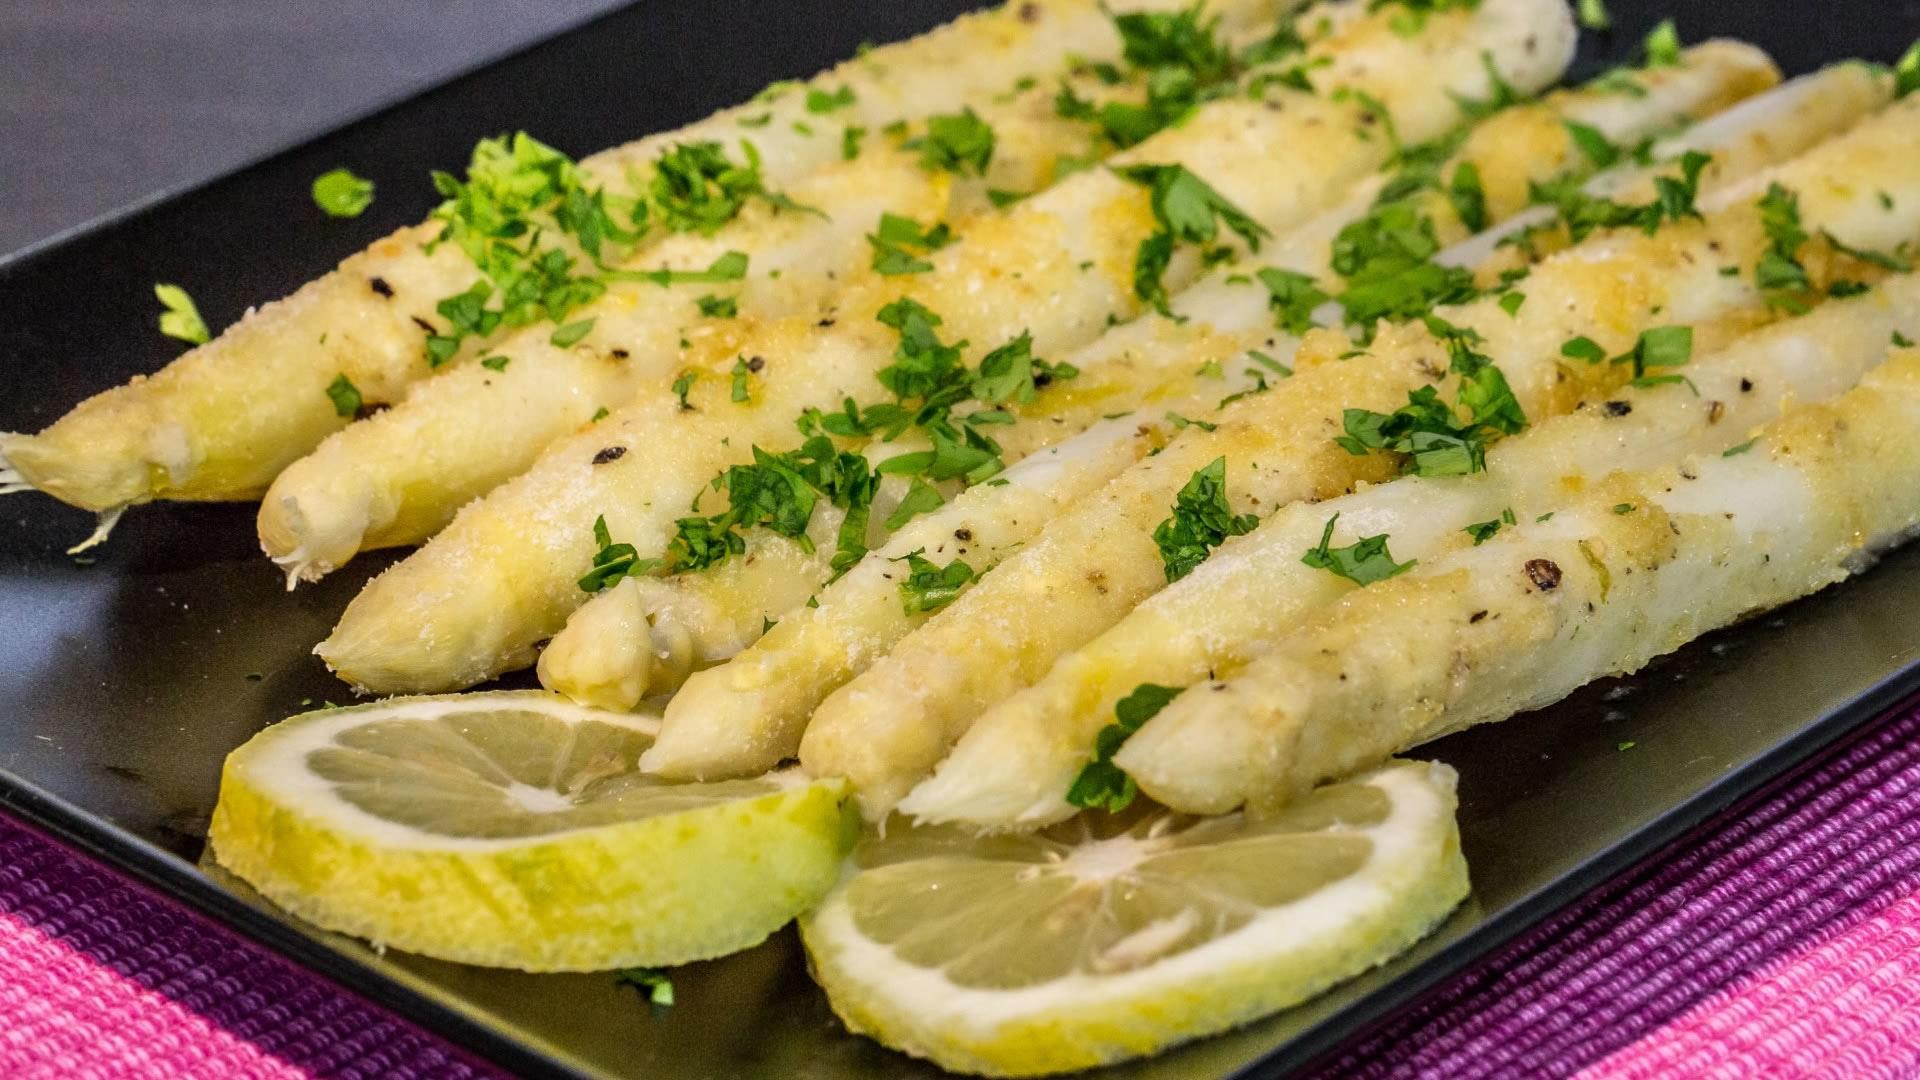 Asparagi gratinati al microonde for Microonde ricette